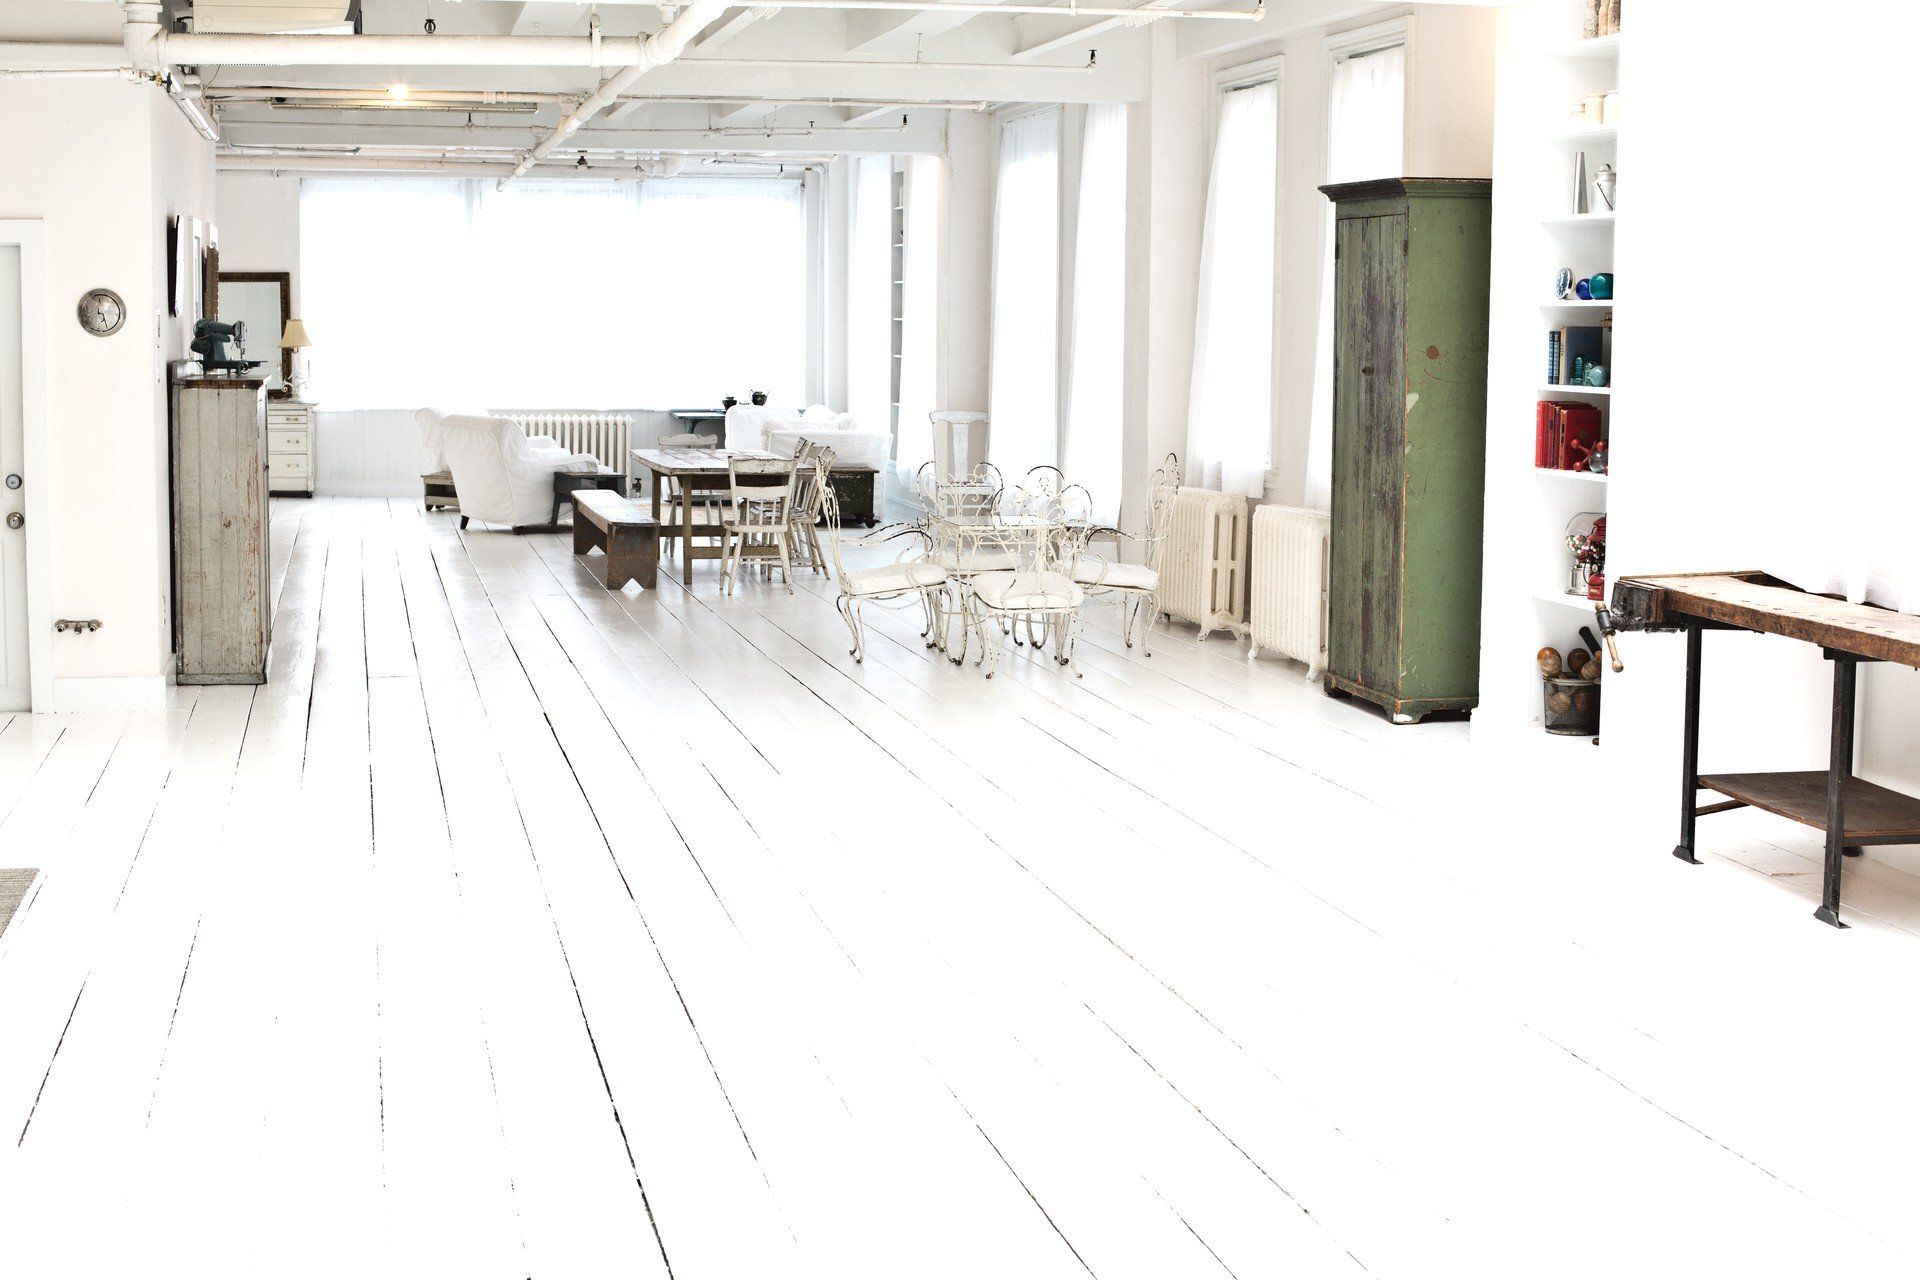 NYC workshop spaces Foto Studio Gary´s Loft - Penthouse image 0